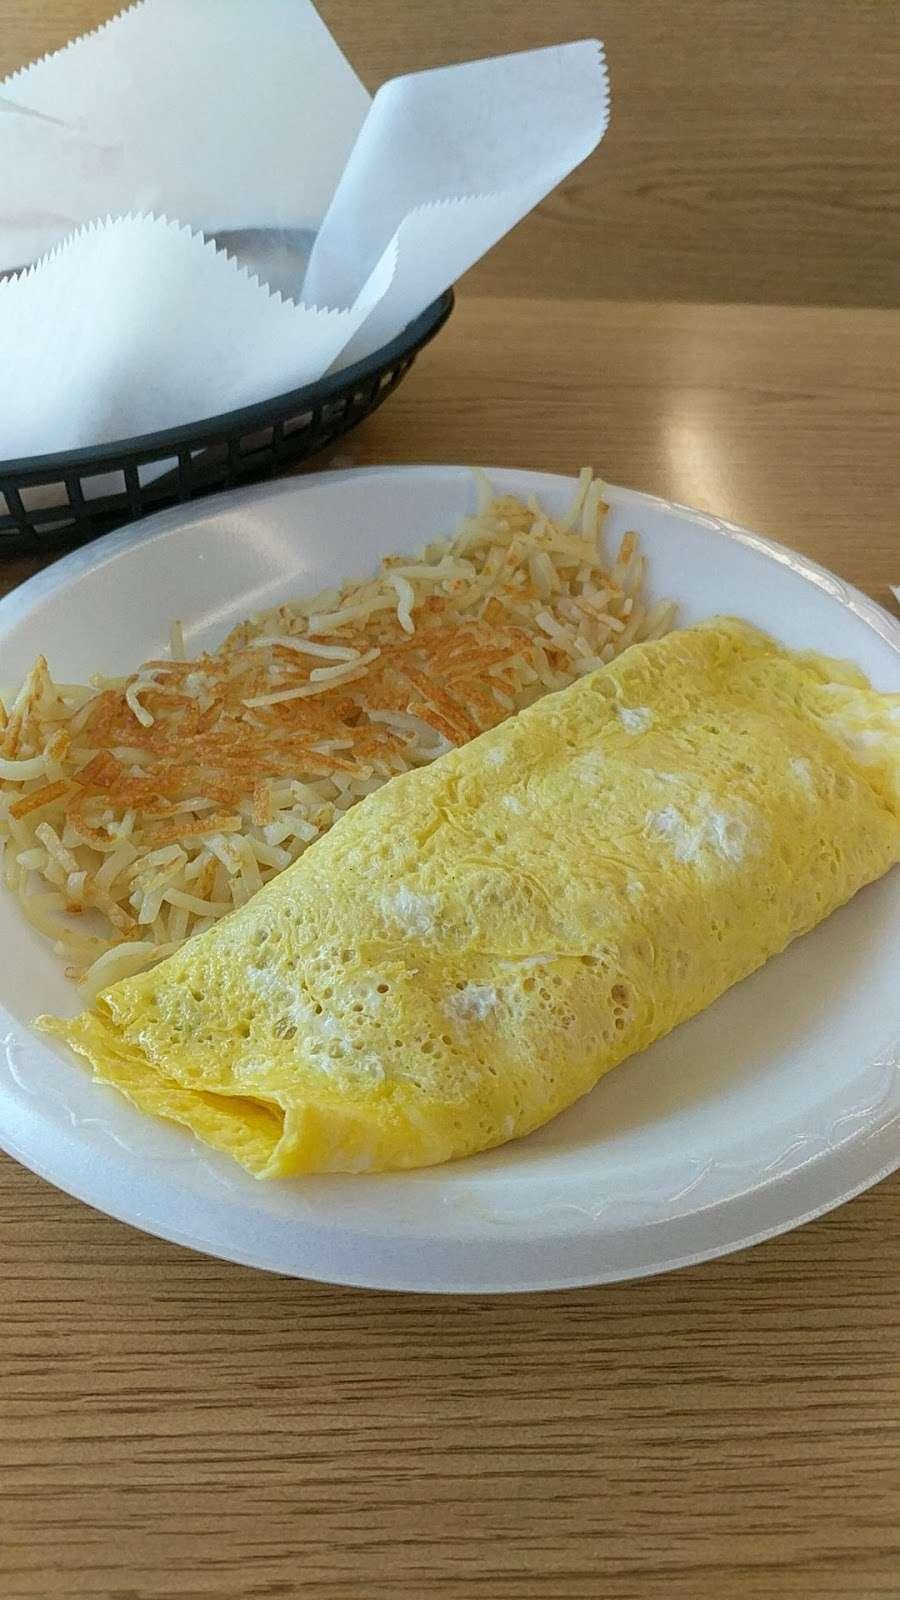 Wahoos Diner - restaurant  | Photo 7 of 9 | Address: 110 N Salisbury GQ Ave, Salisbury, NC 28146, USA | Phone: (704) 209-0503